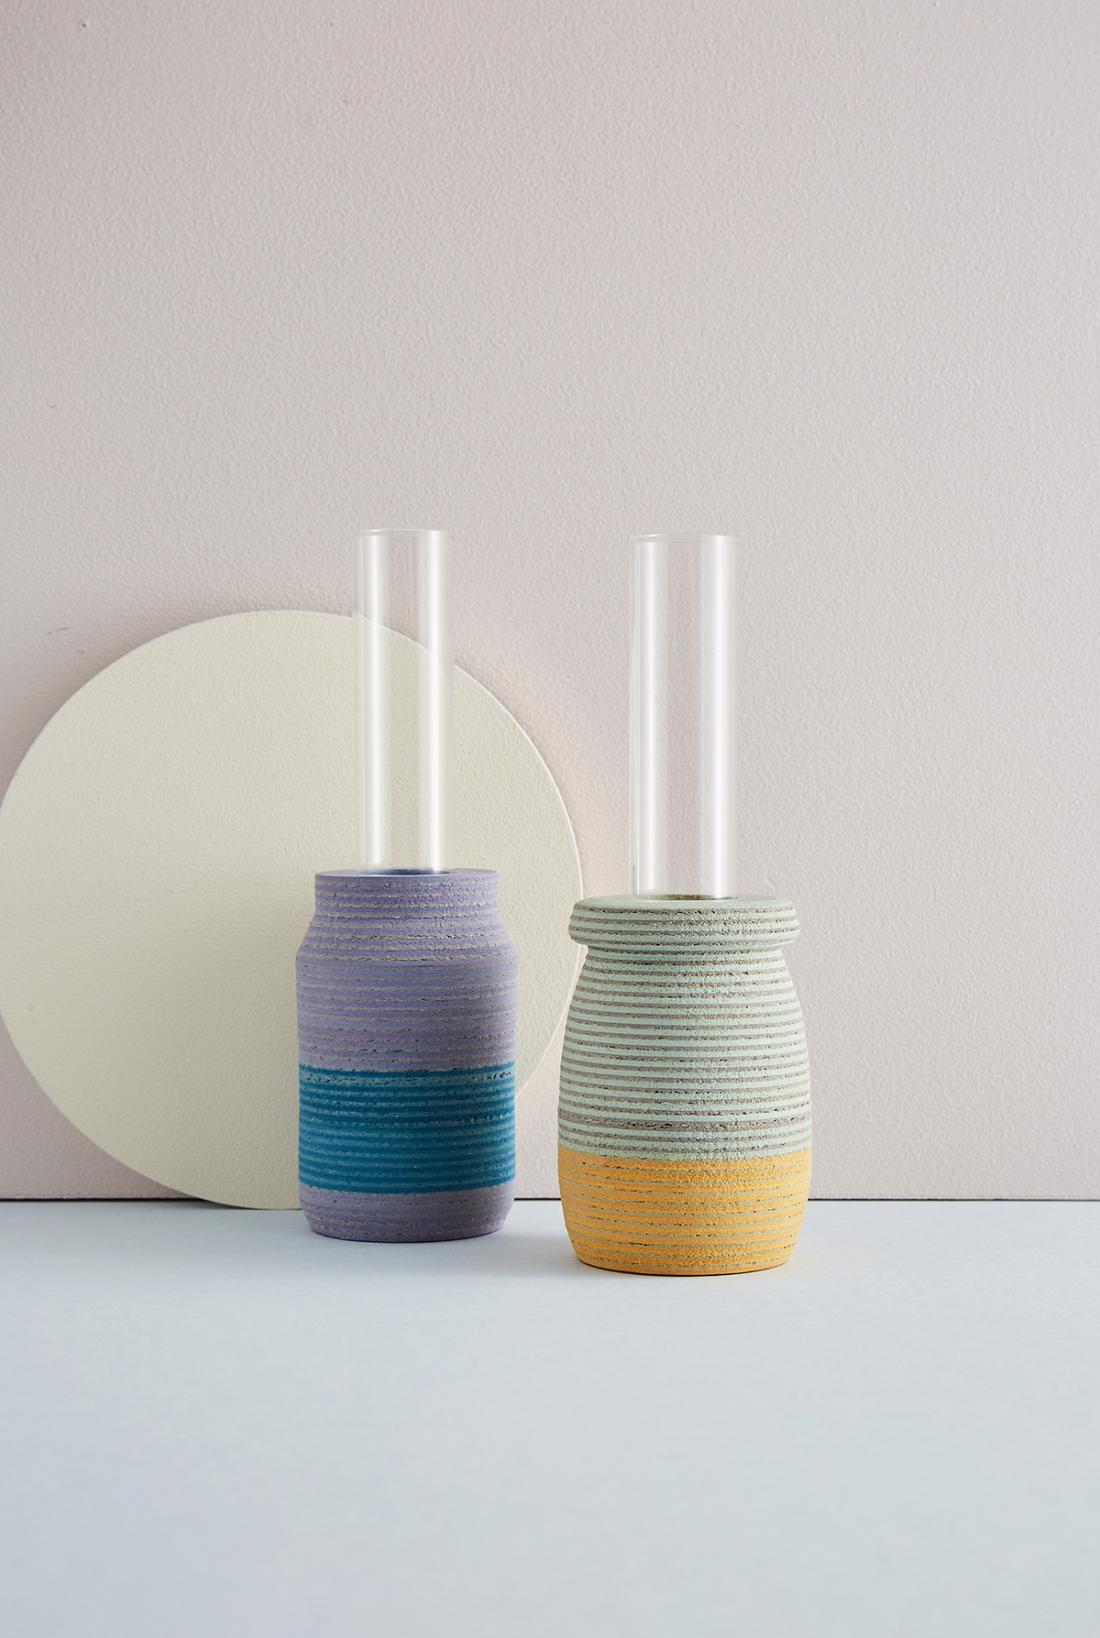 Single Stem Vase by Laura Jane Atkinson. Photography by Yeshen Venema